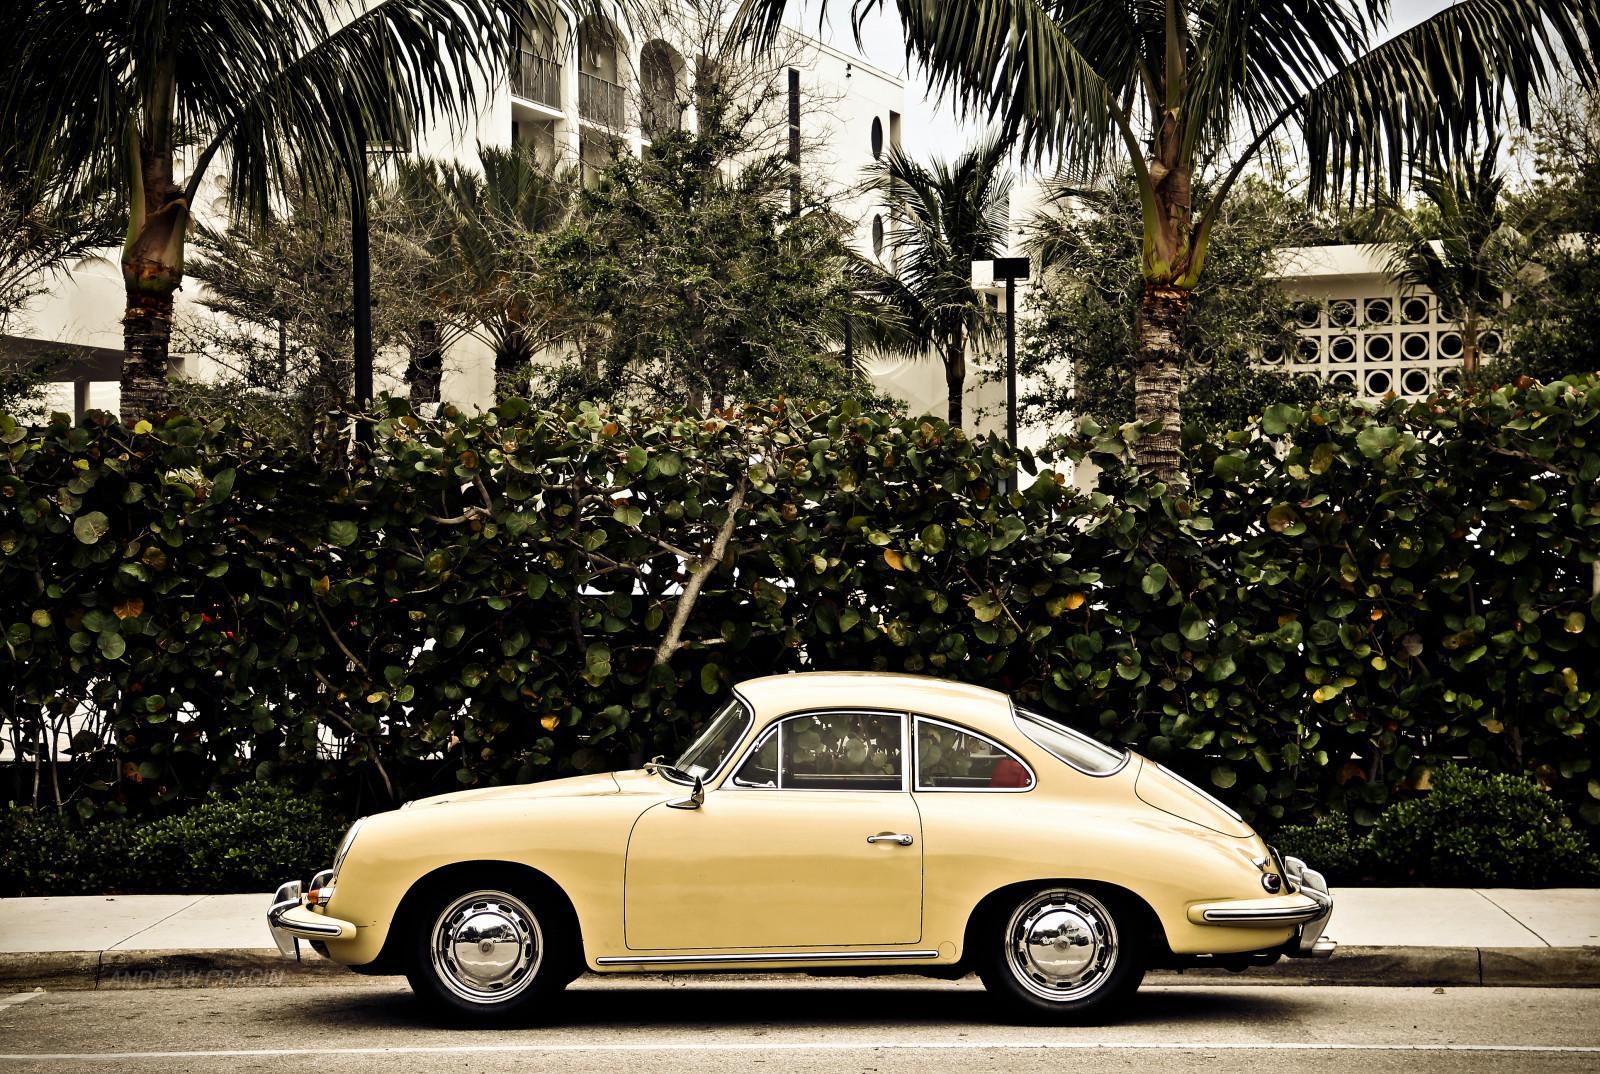 Pin by Classic car list on Classic car list | Classic cars ...  |Best European Classic Cars